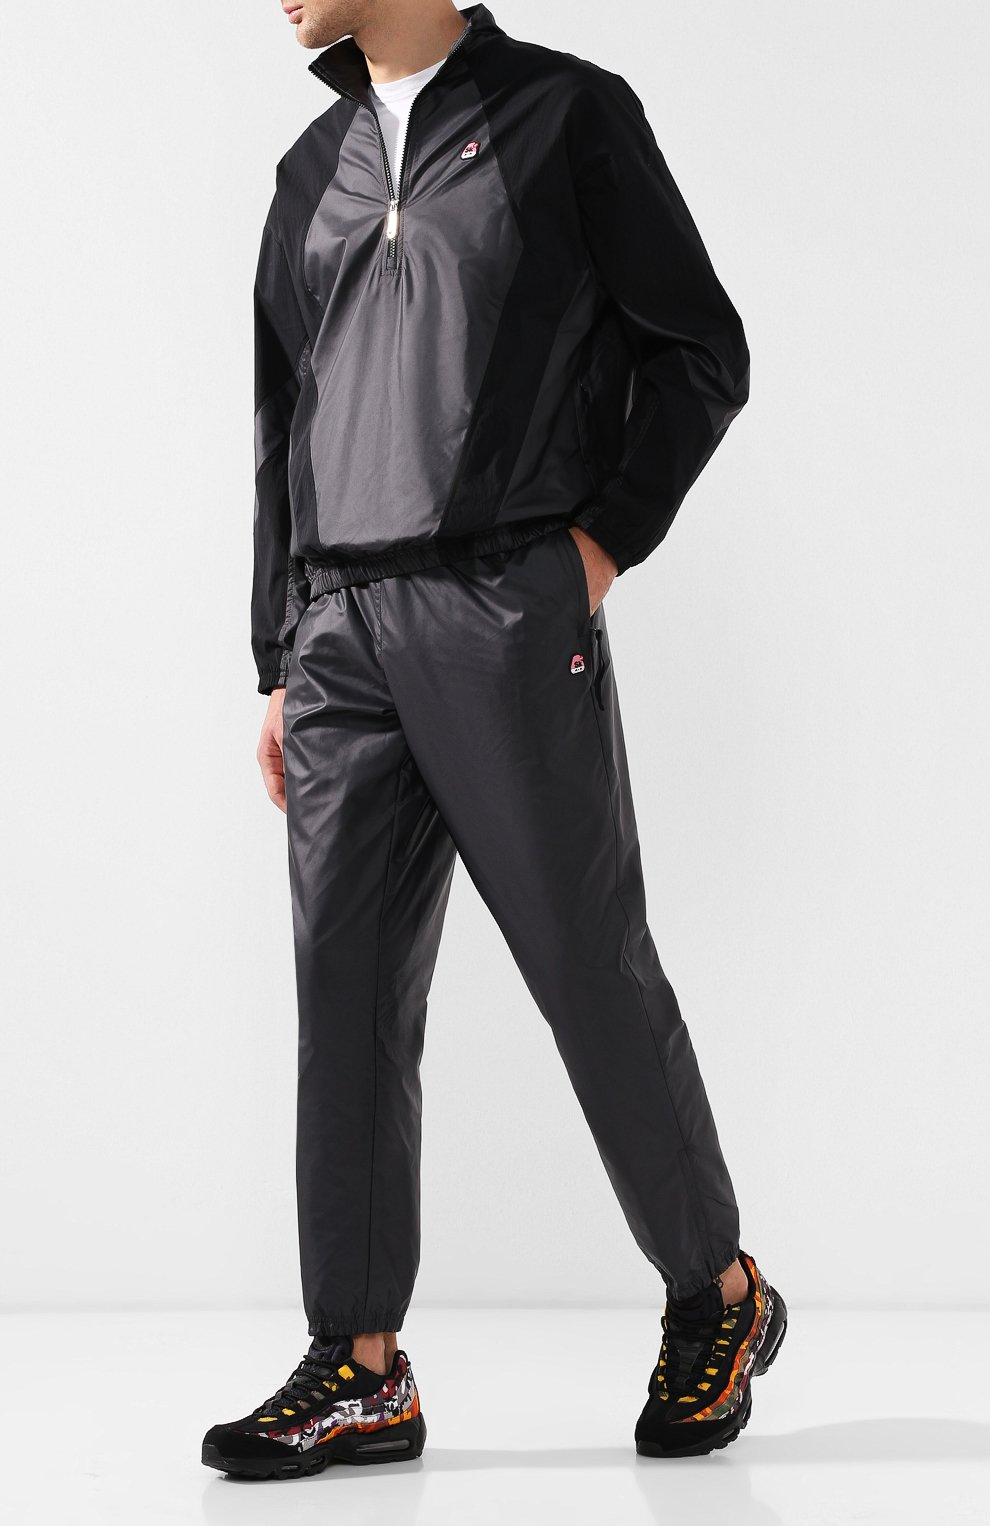 315e9531 Спортивный костюм Nike x Skepta NIKELAB черного цвета — купить за ...